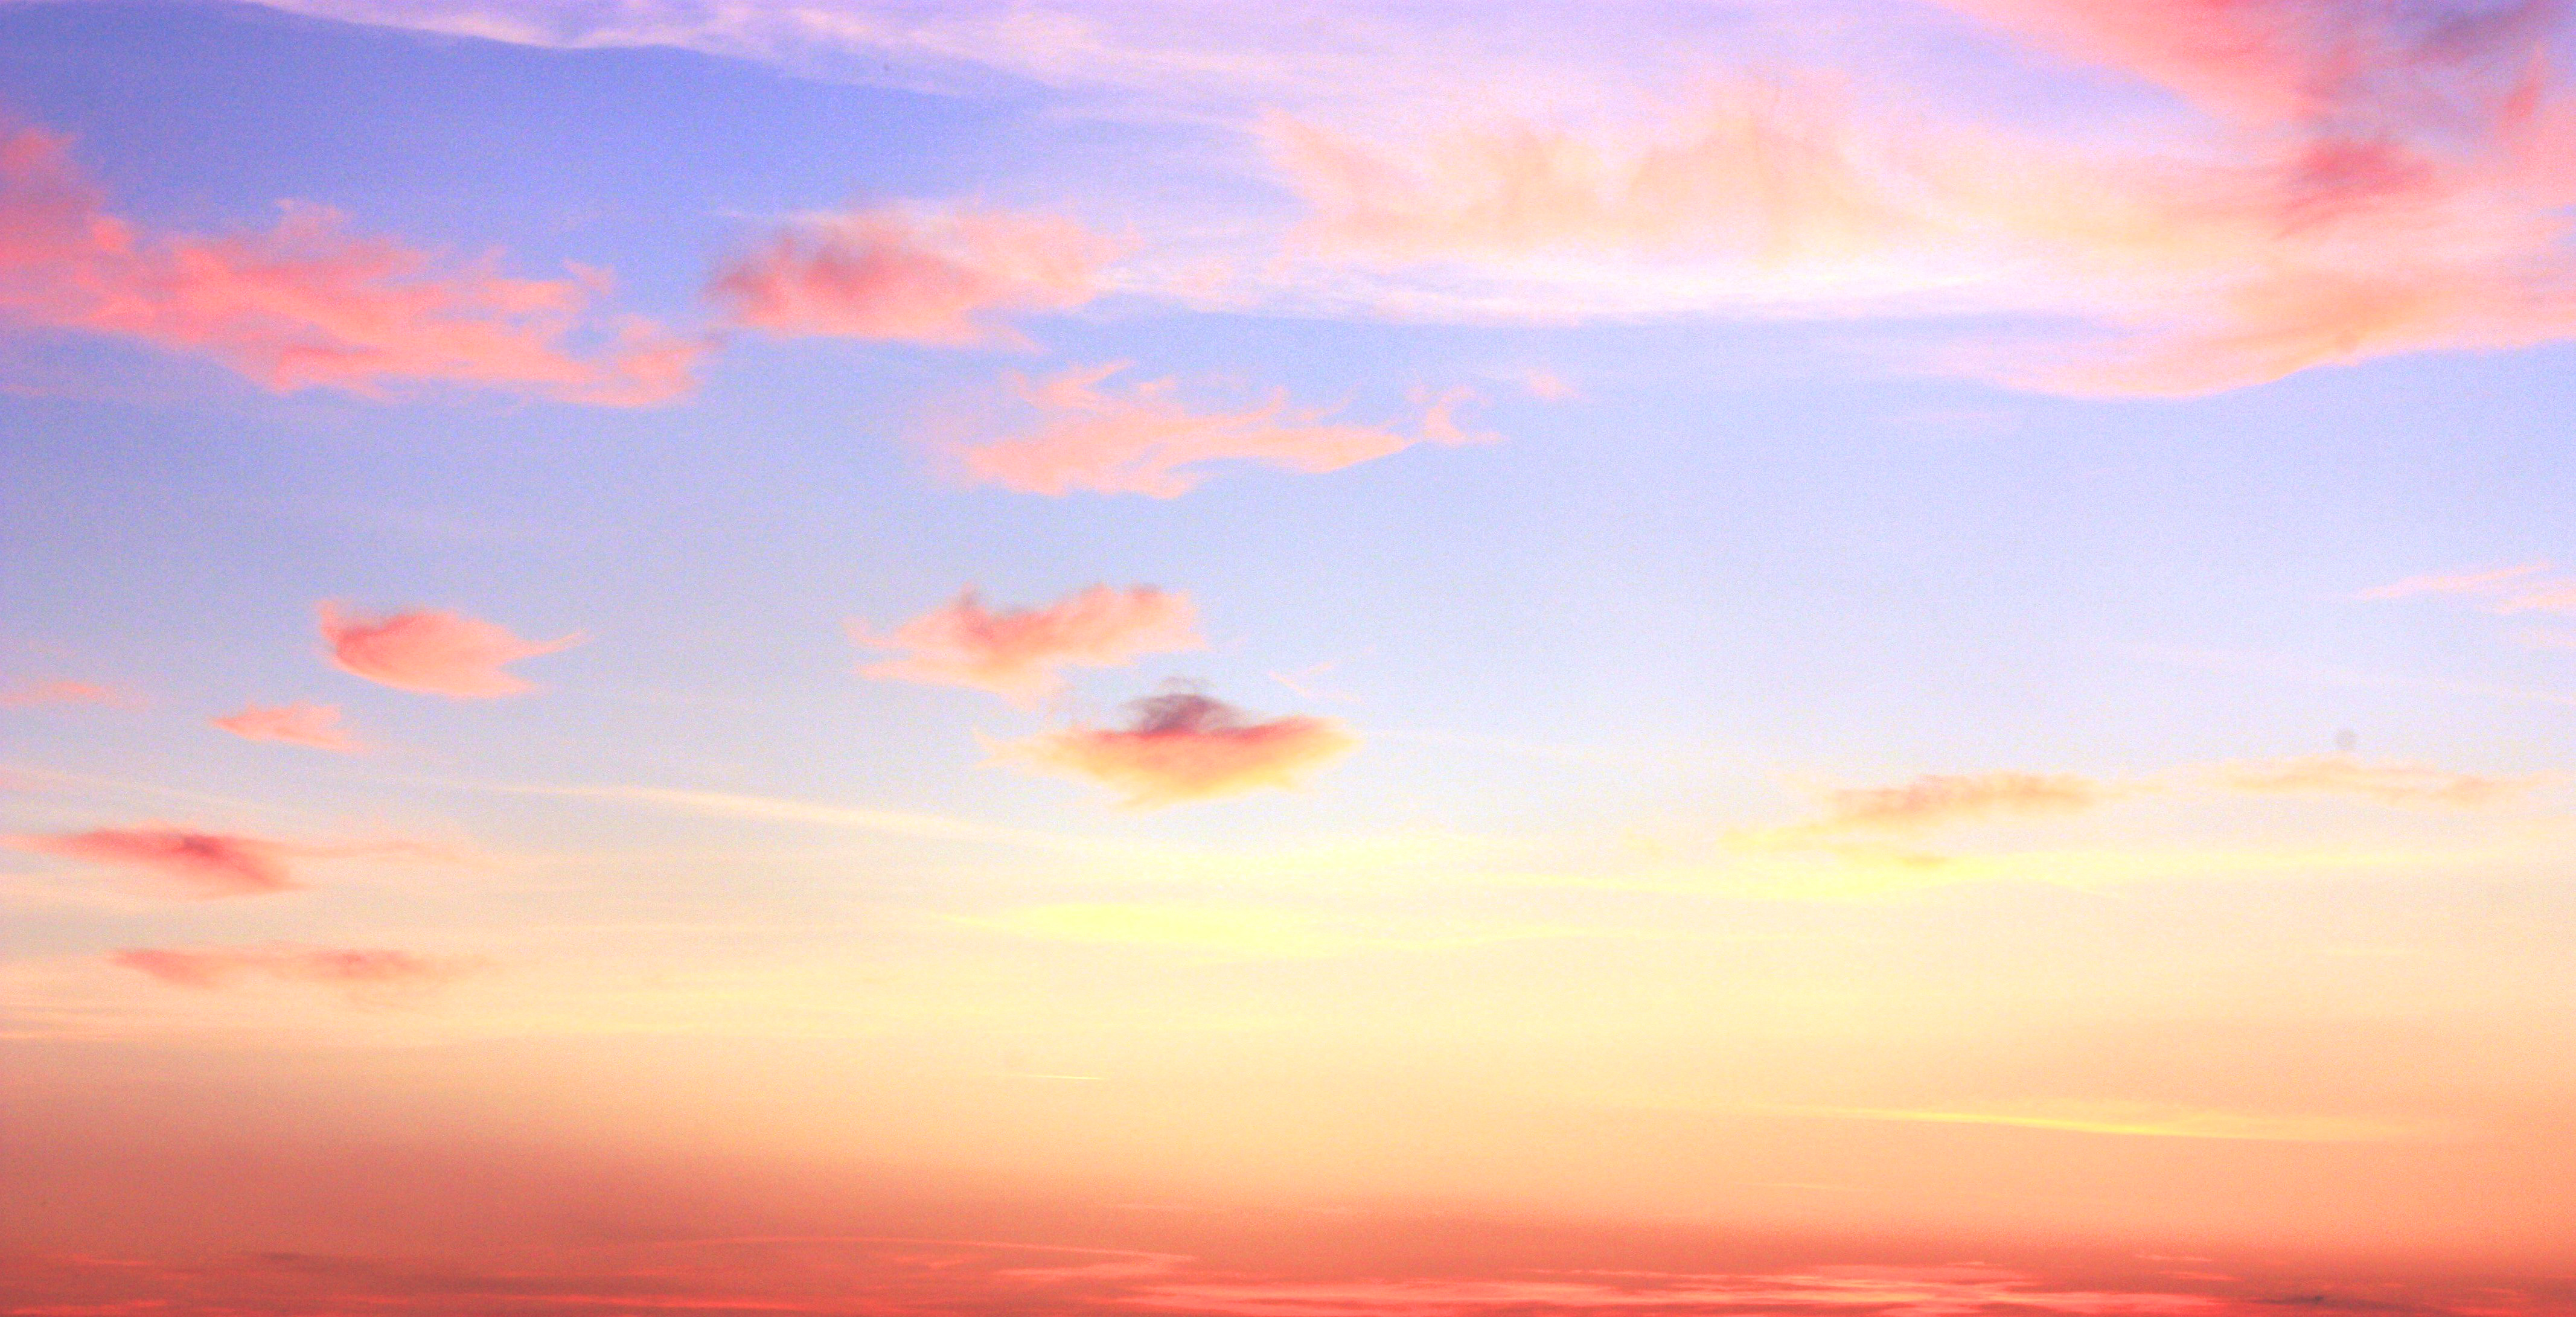 Anime Sunset Wallpaper Travel Theme Sky Lucid Gypsy